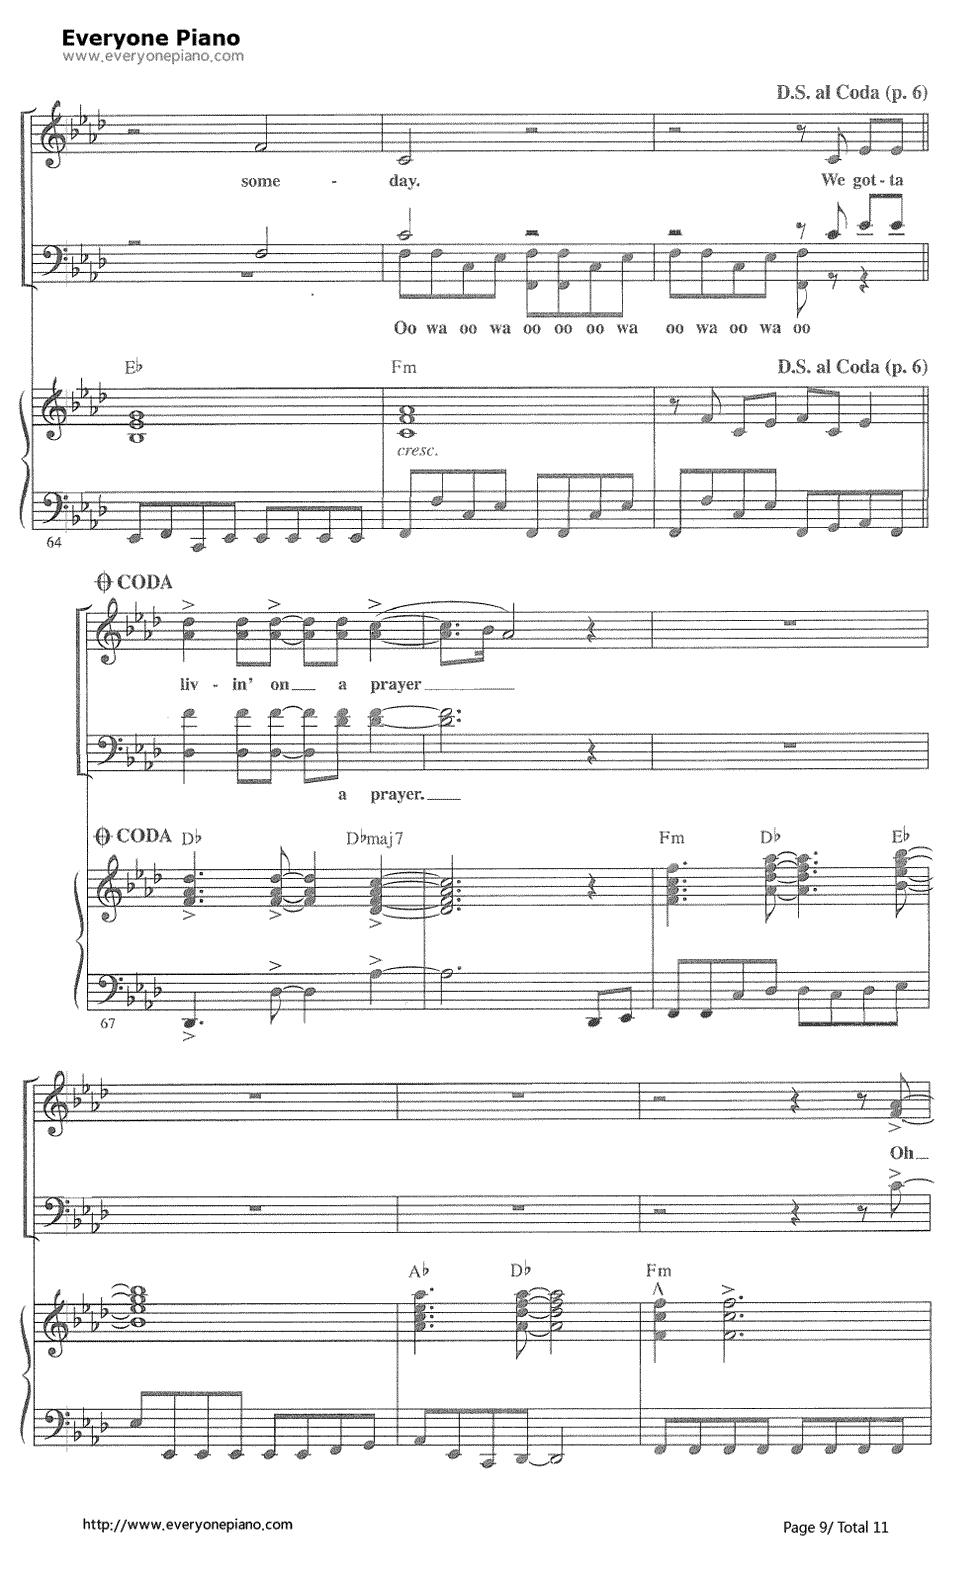 on Jovi五线谱预览9 钢琴谱档 五线谱 双手简谱 数位谱 Midi PDF 免费